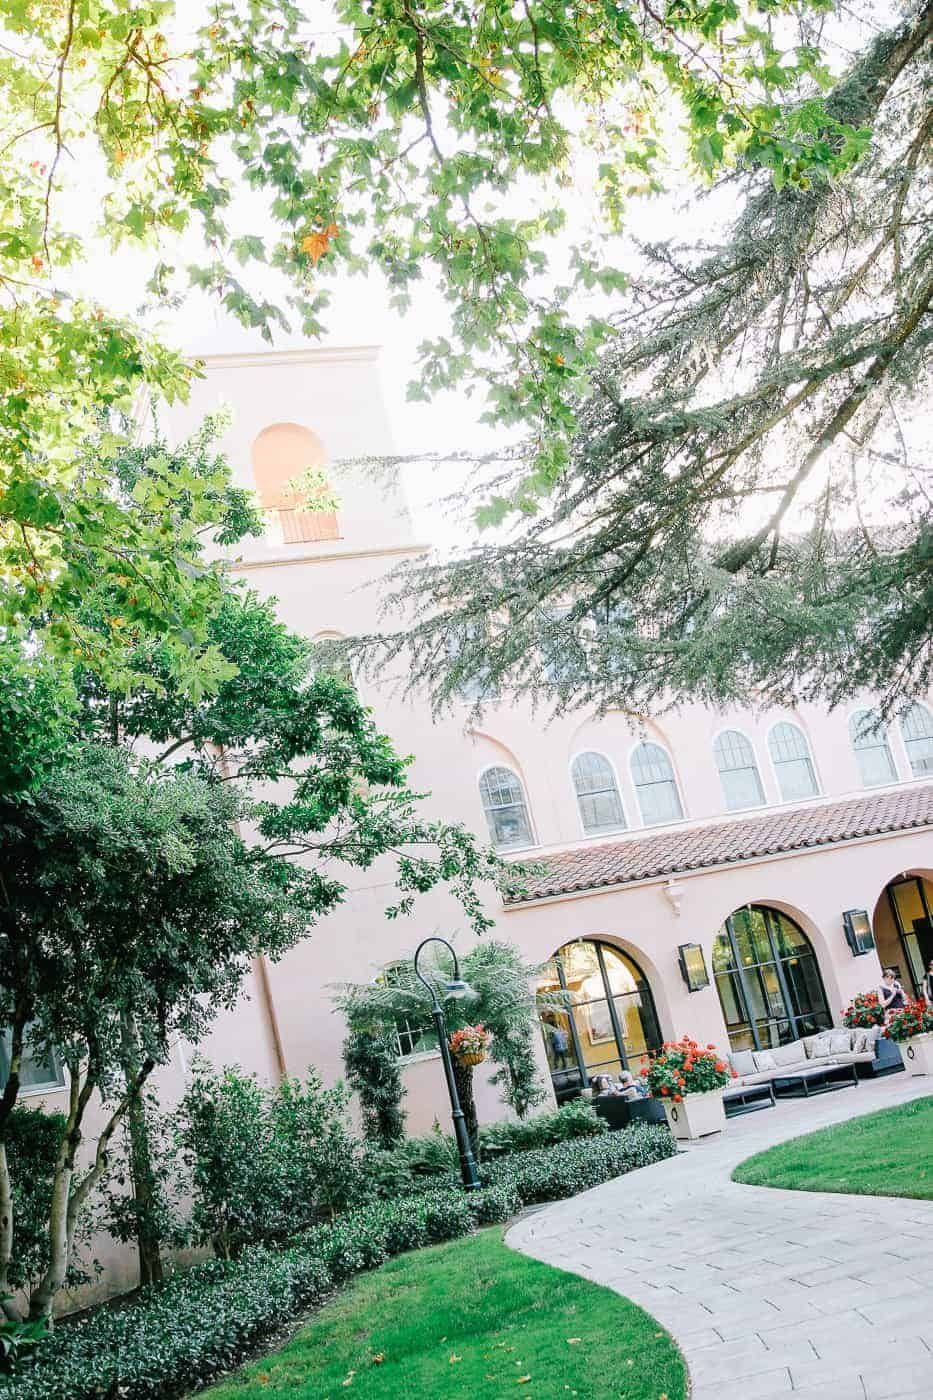 luxury hotels in Sonoma California